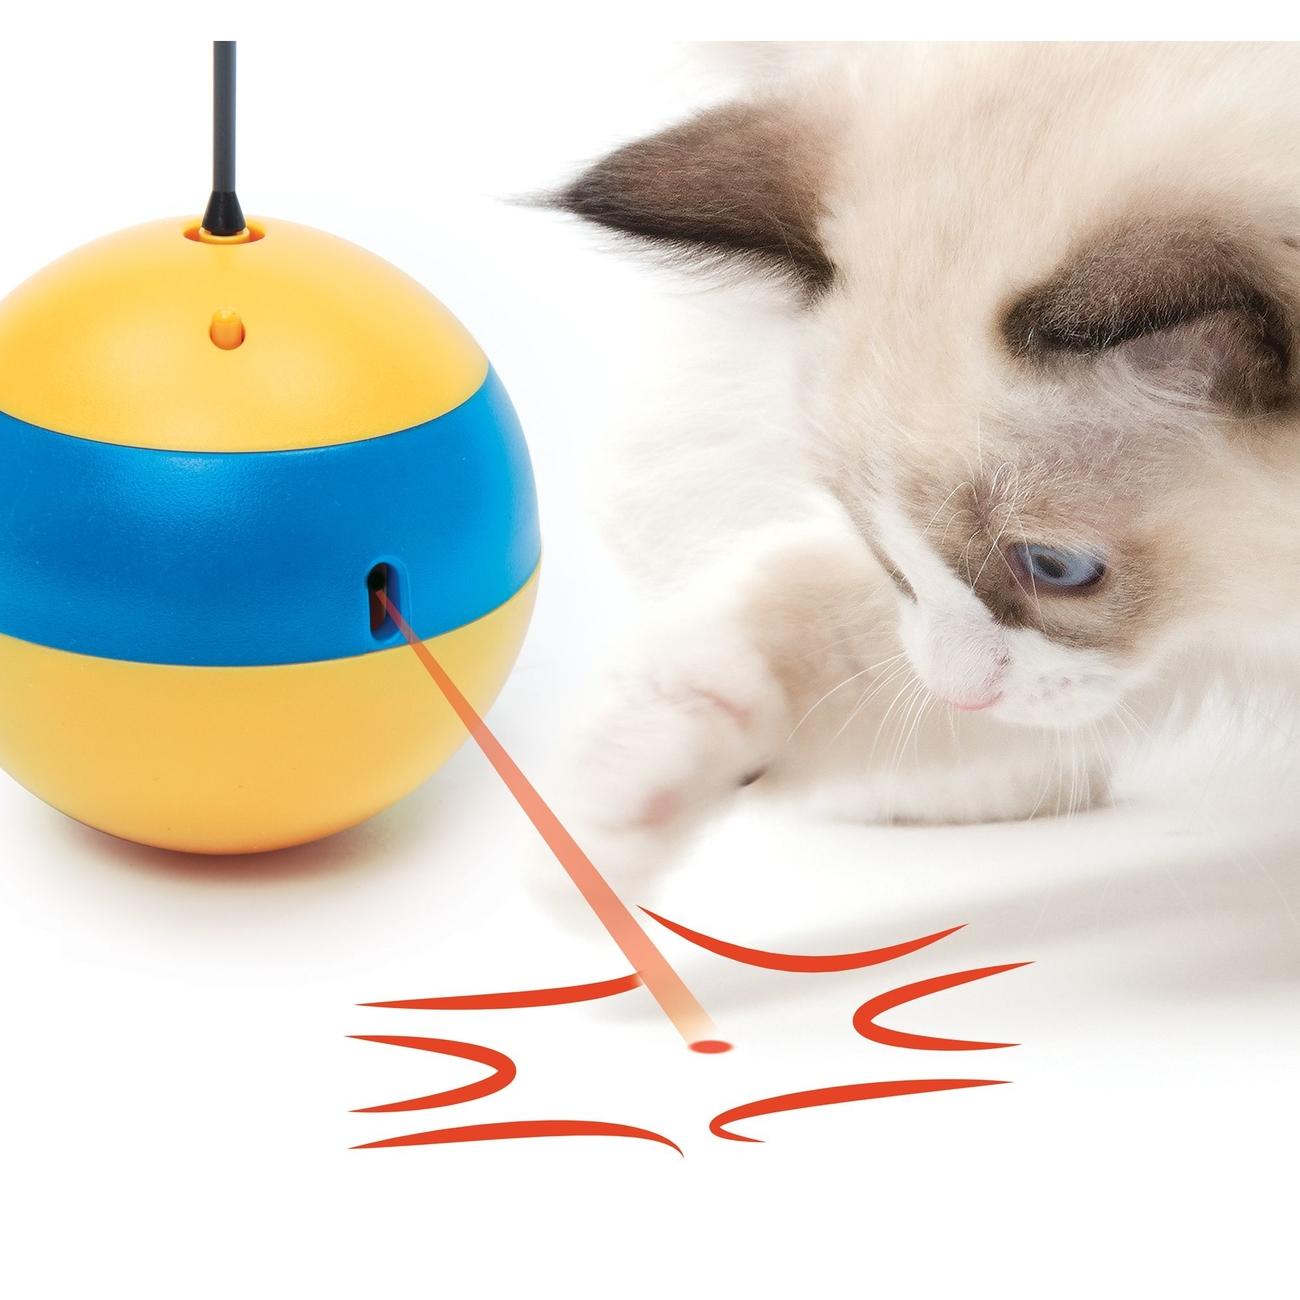 Catit Play 2.0 Tumbler Bee Laserspielzeug Bild 3